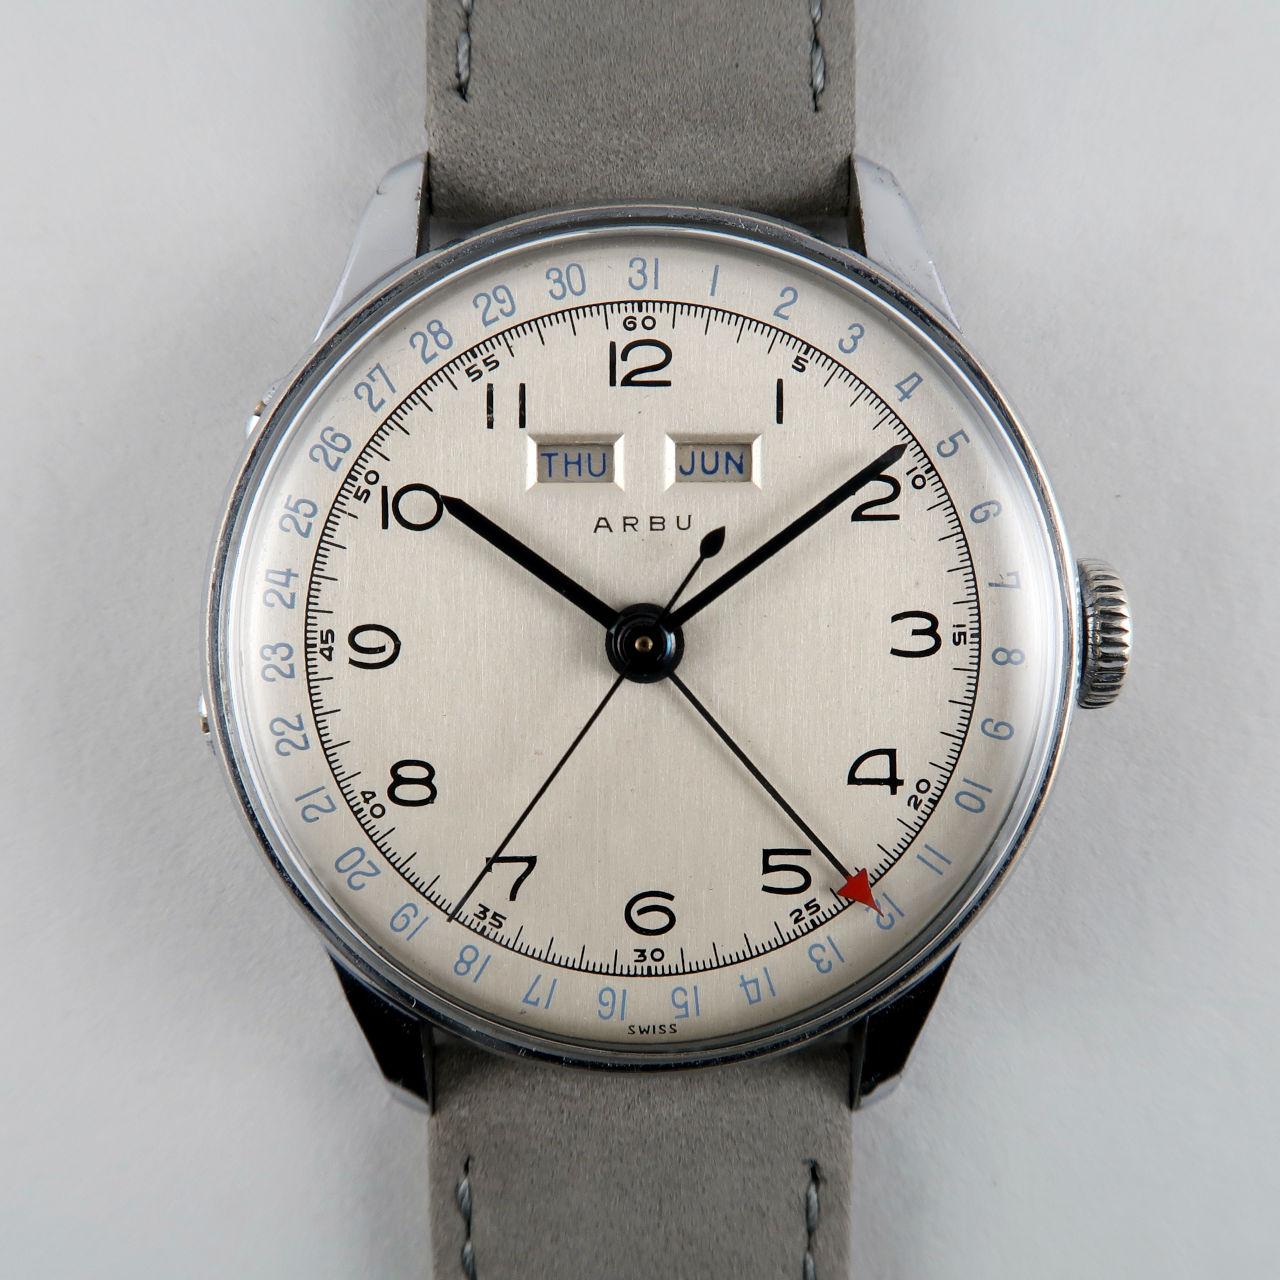 Arbu circa 1950 | steel and chromed triple calendar wristwatch